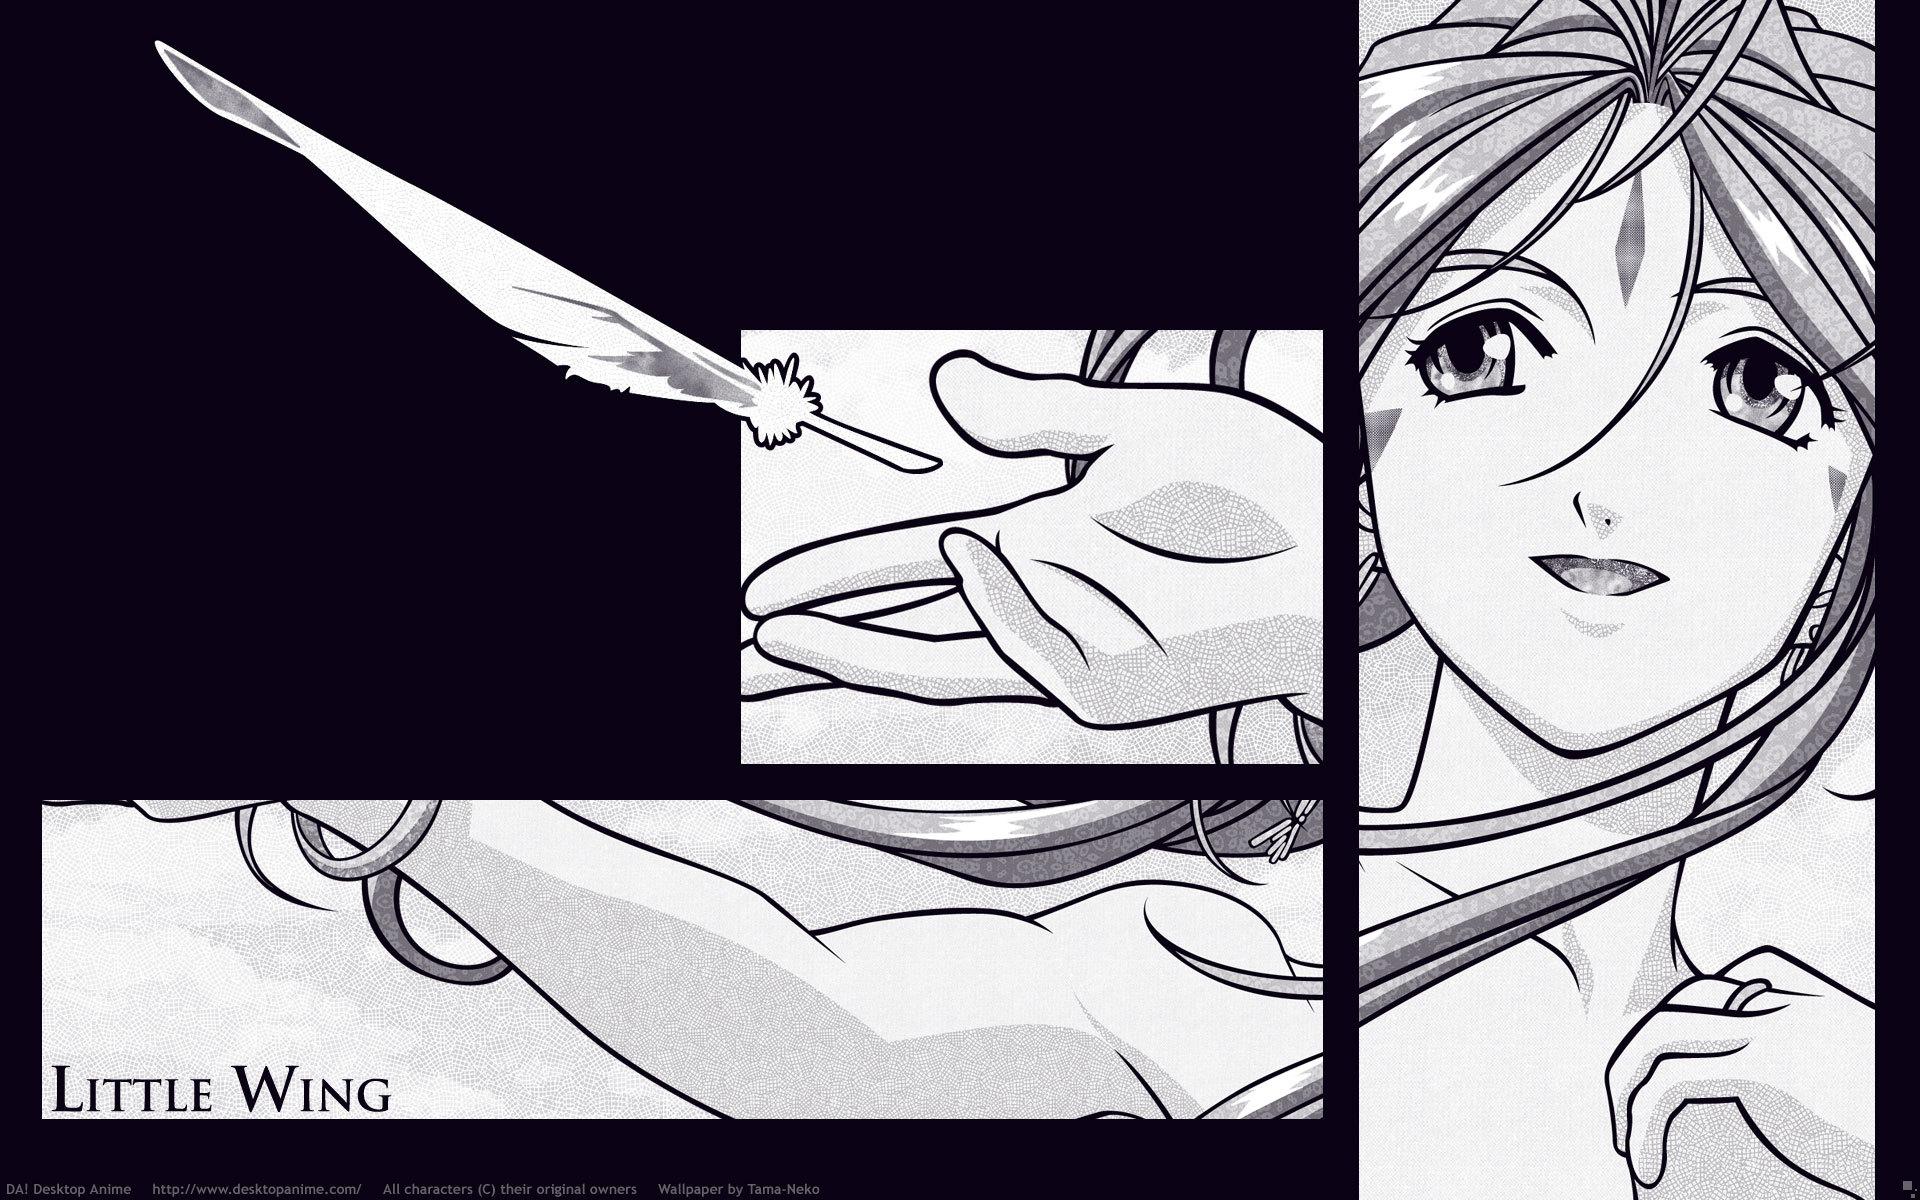 Fond Décran Illustration Monochrome Filles Anime Manga